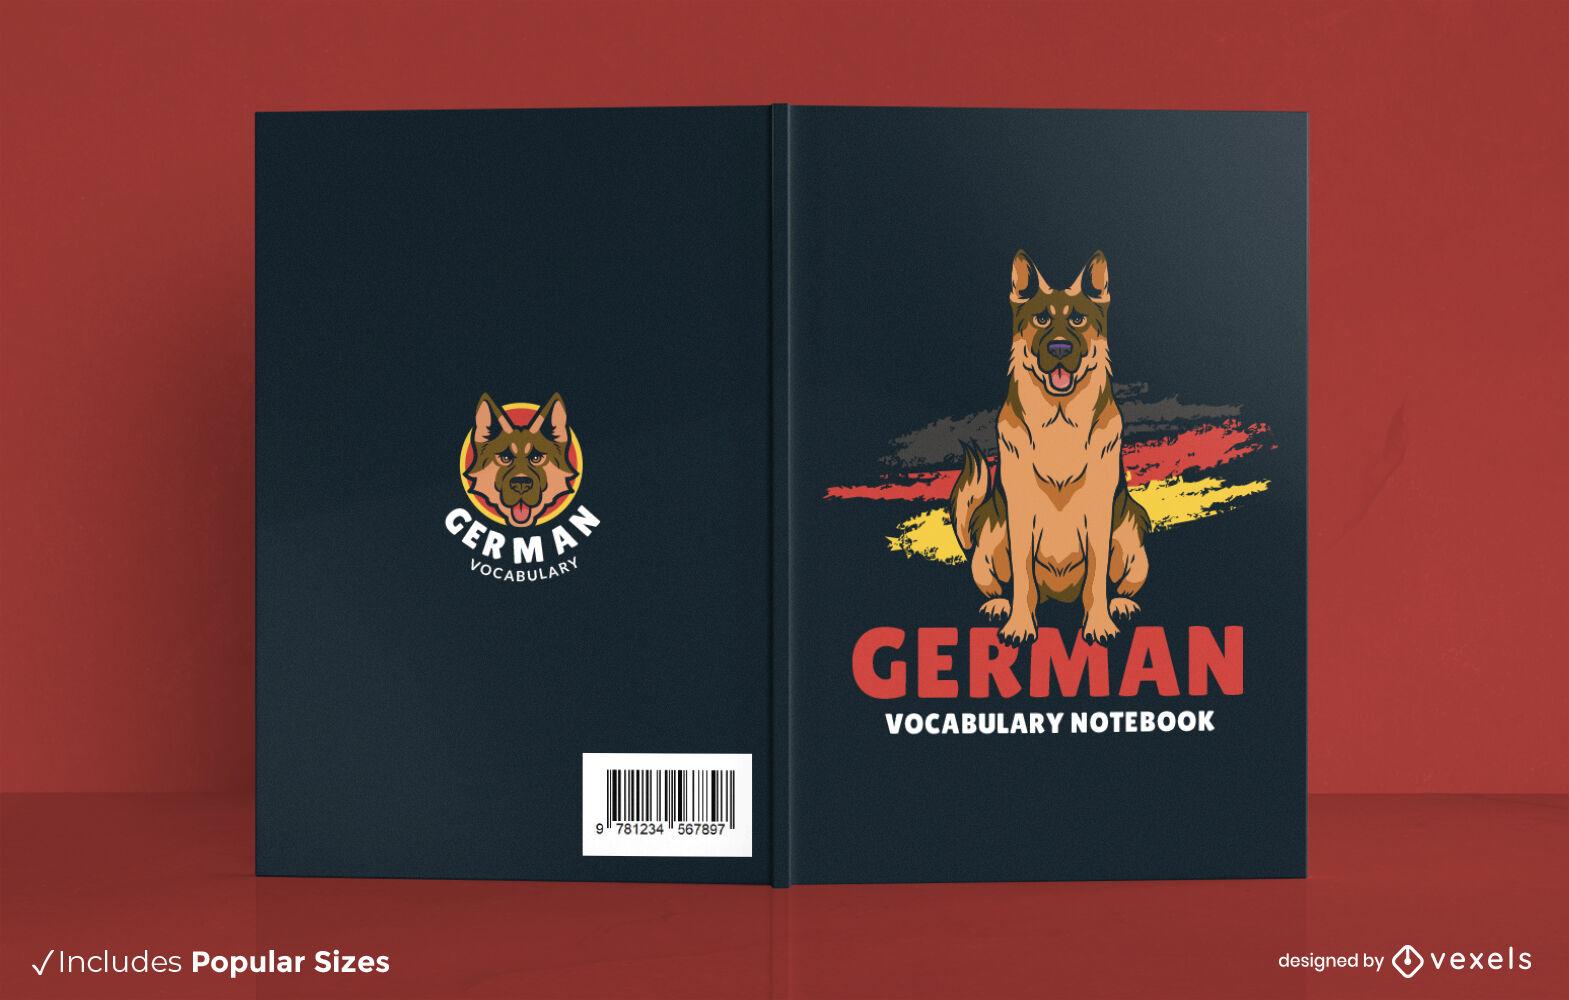 German vocabulary notebook book cover design